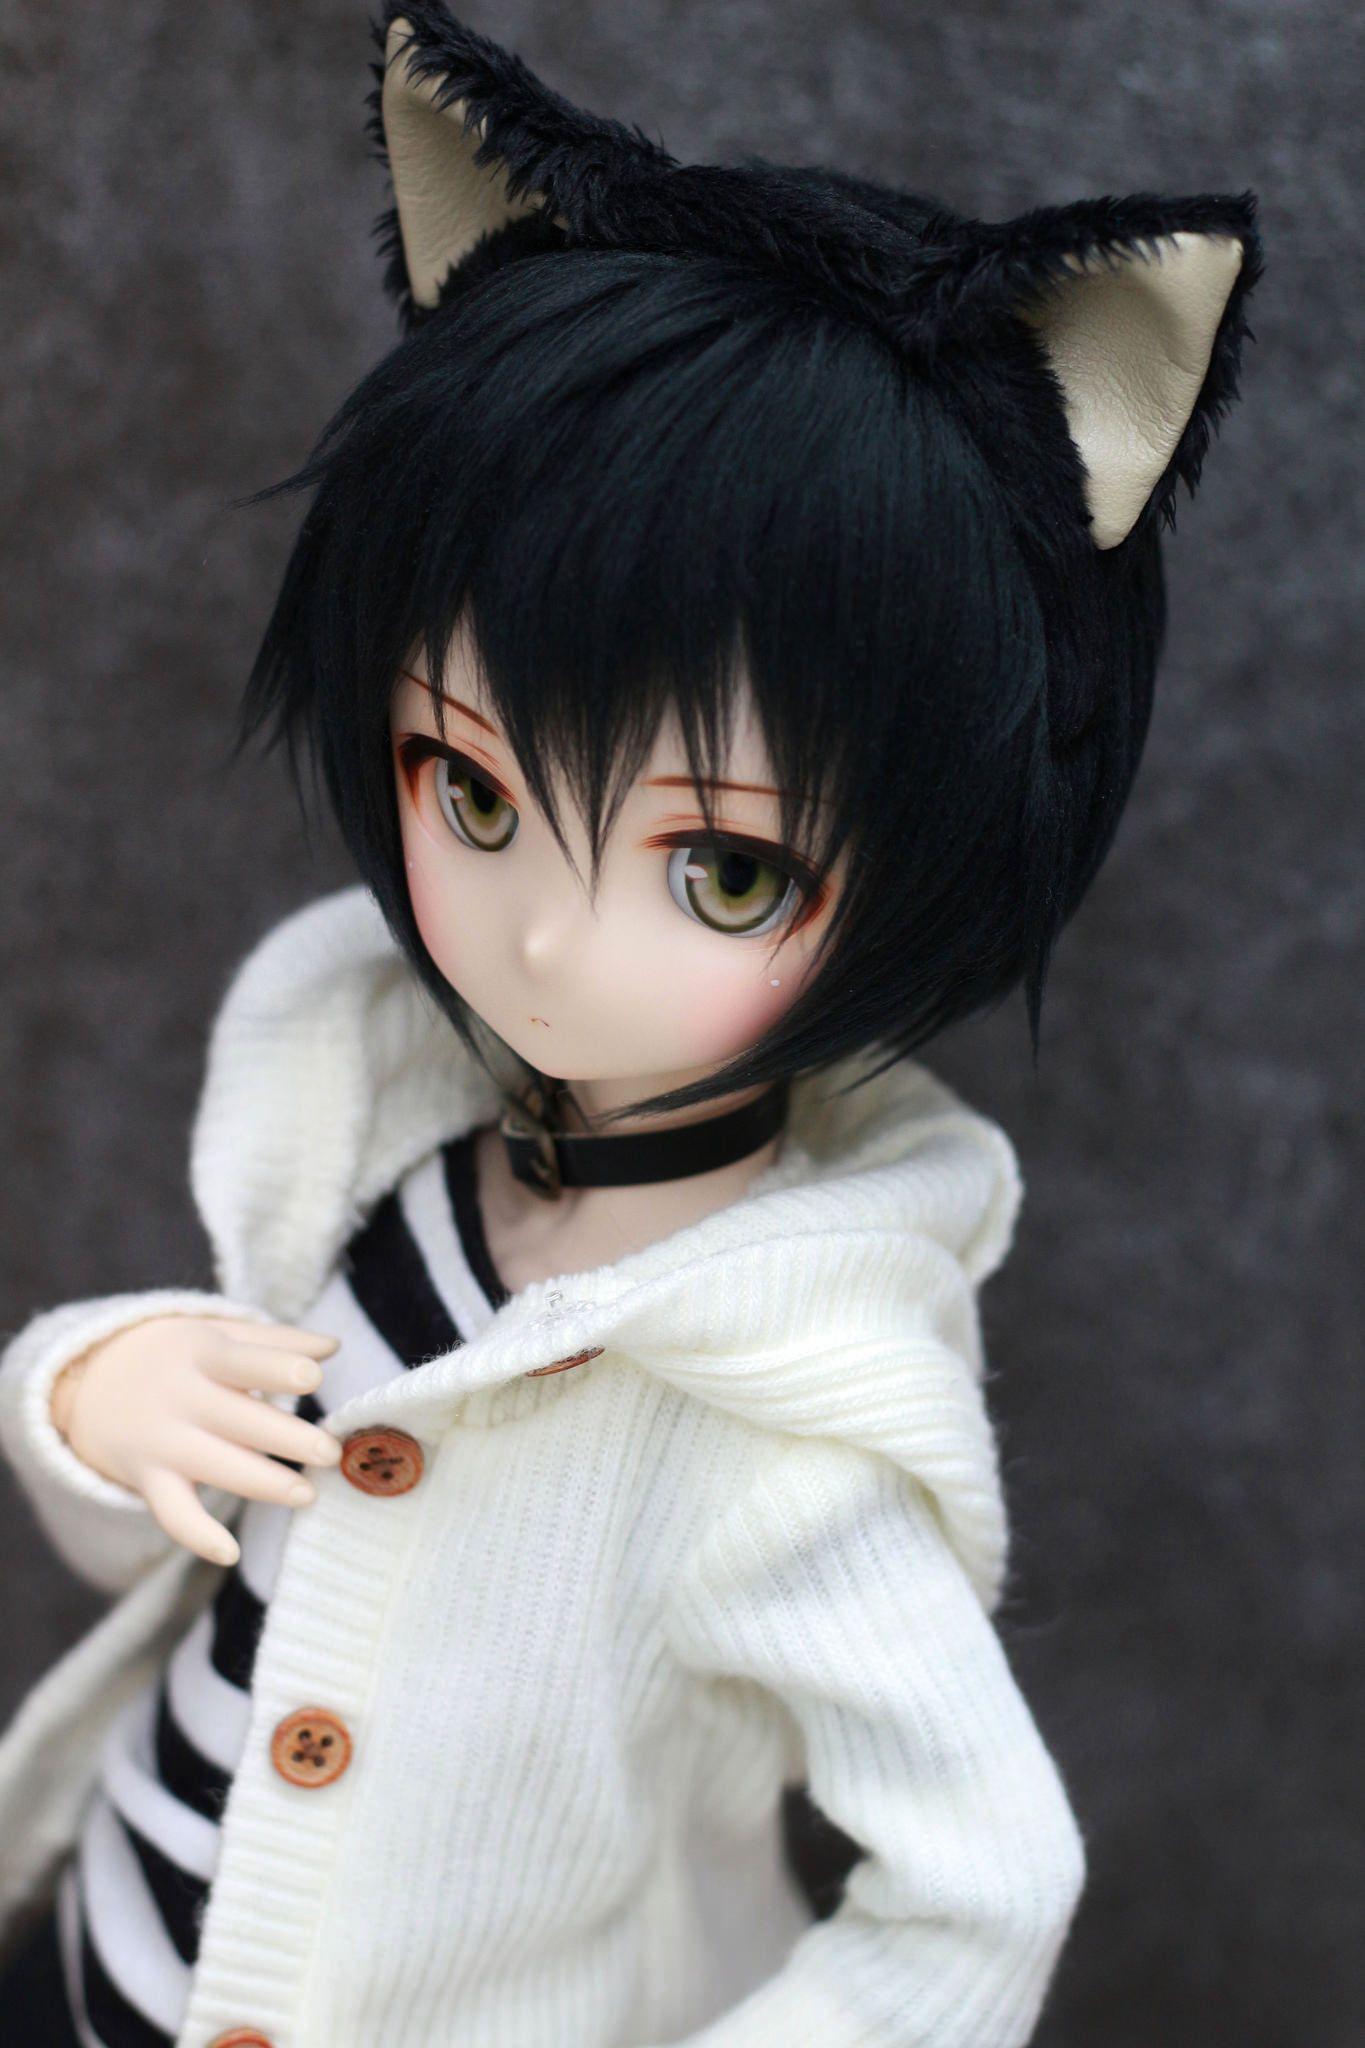 201510 「MDD黒猫セット」 คาวาอี ตุ๊กตาแฟชั่น และ สาวน้อย